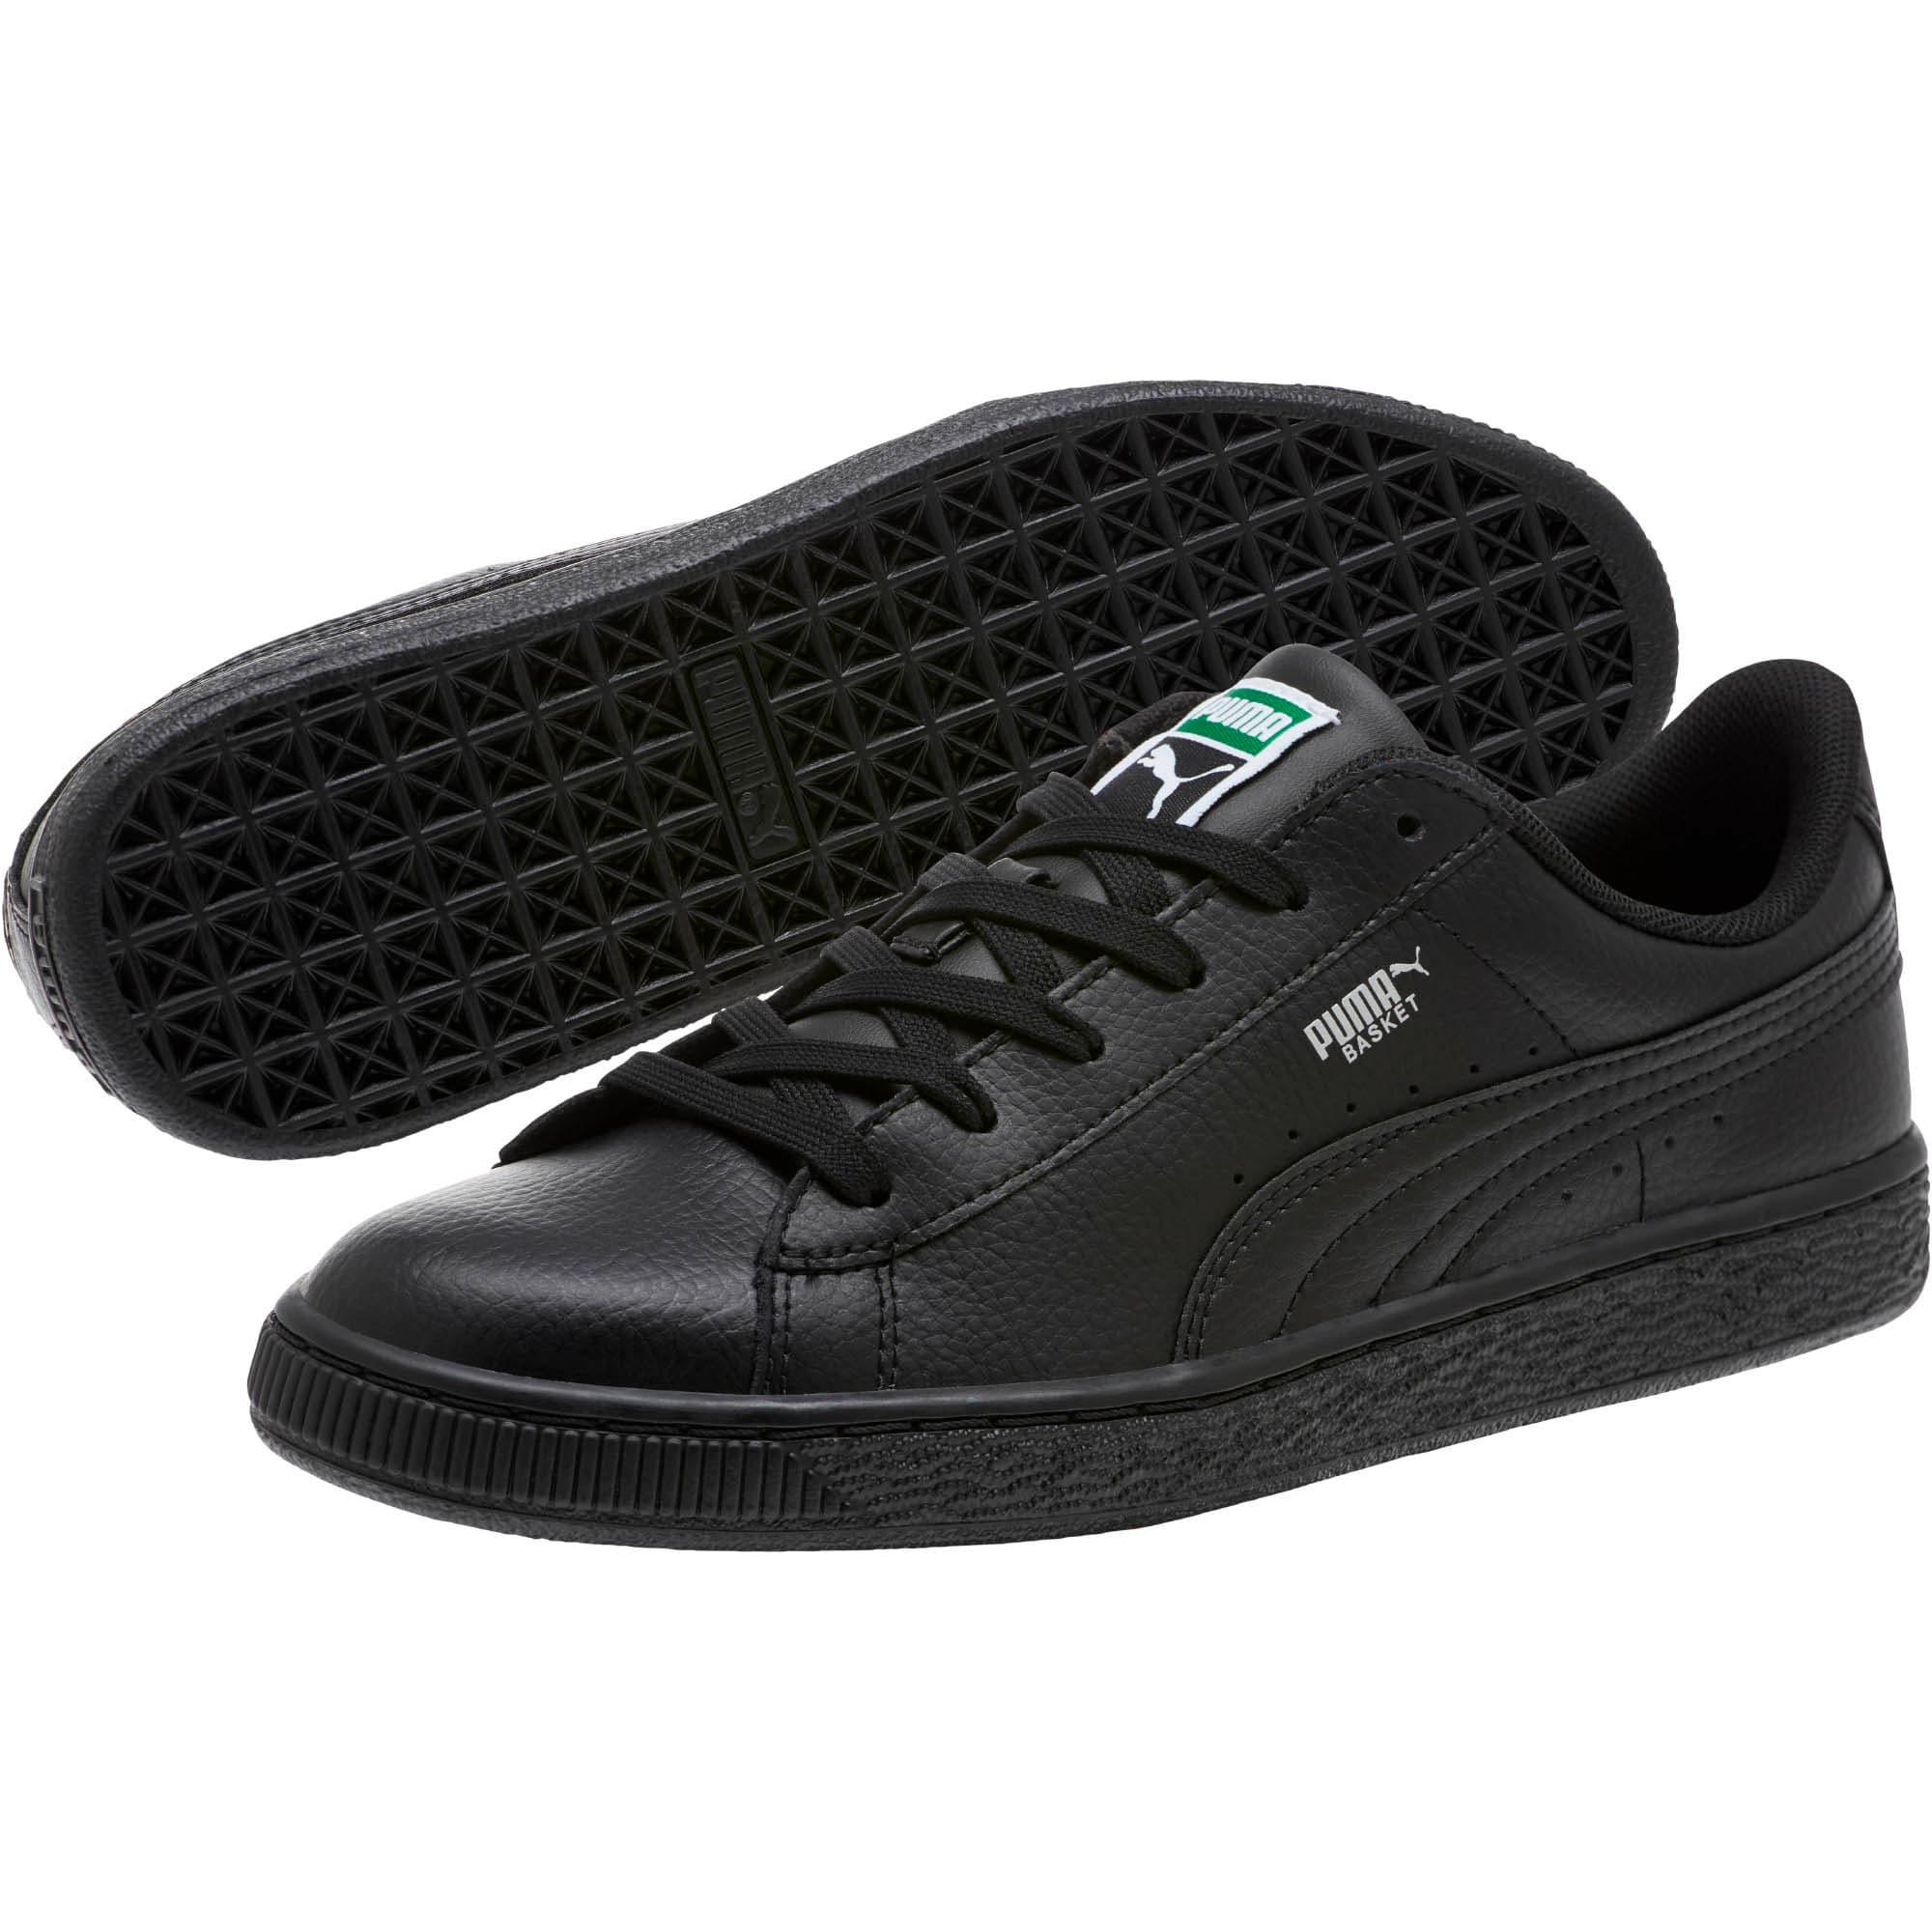 Thumbnail 2 of Basket Classic Sneakers JR, Puma Black-Puma Black, medium